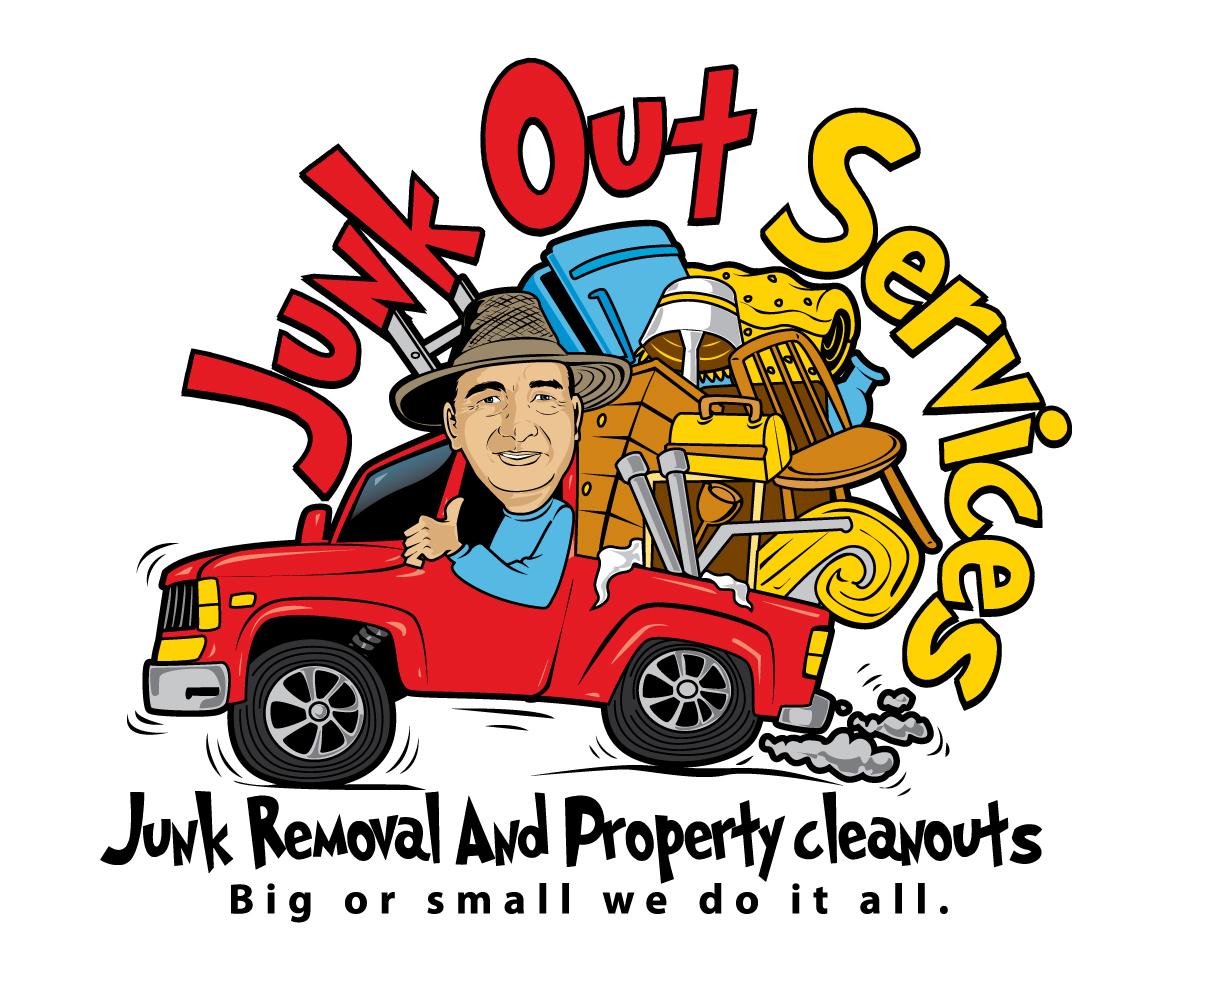 Brunk's junk removal